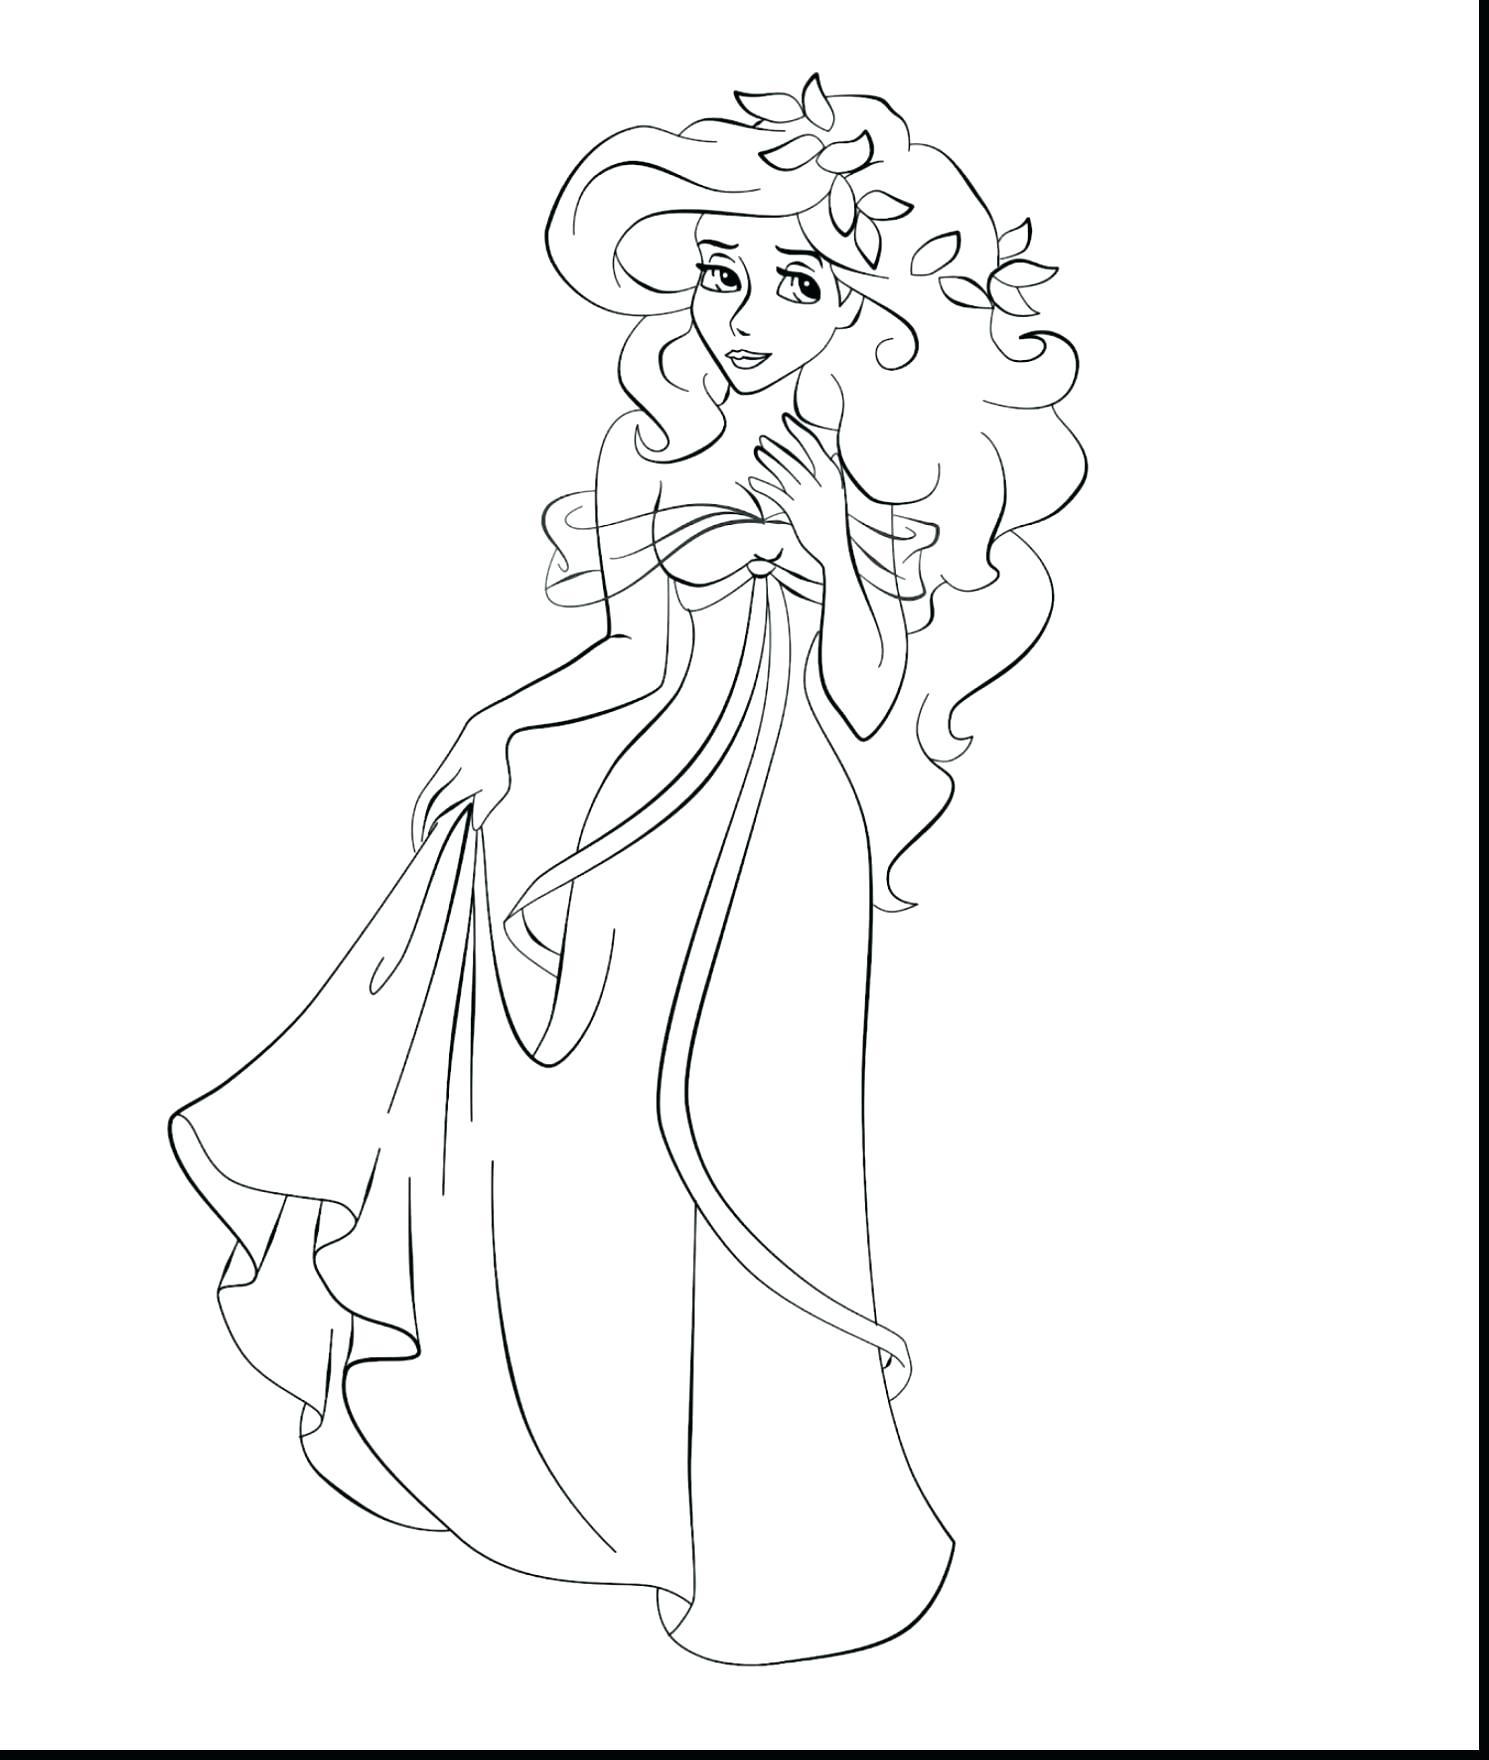 1489x1760 Coloring Baby Disney Coloring Pages Superb Princess Cartoon